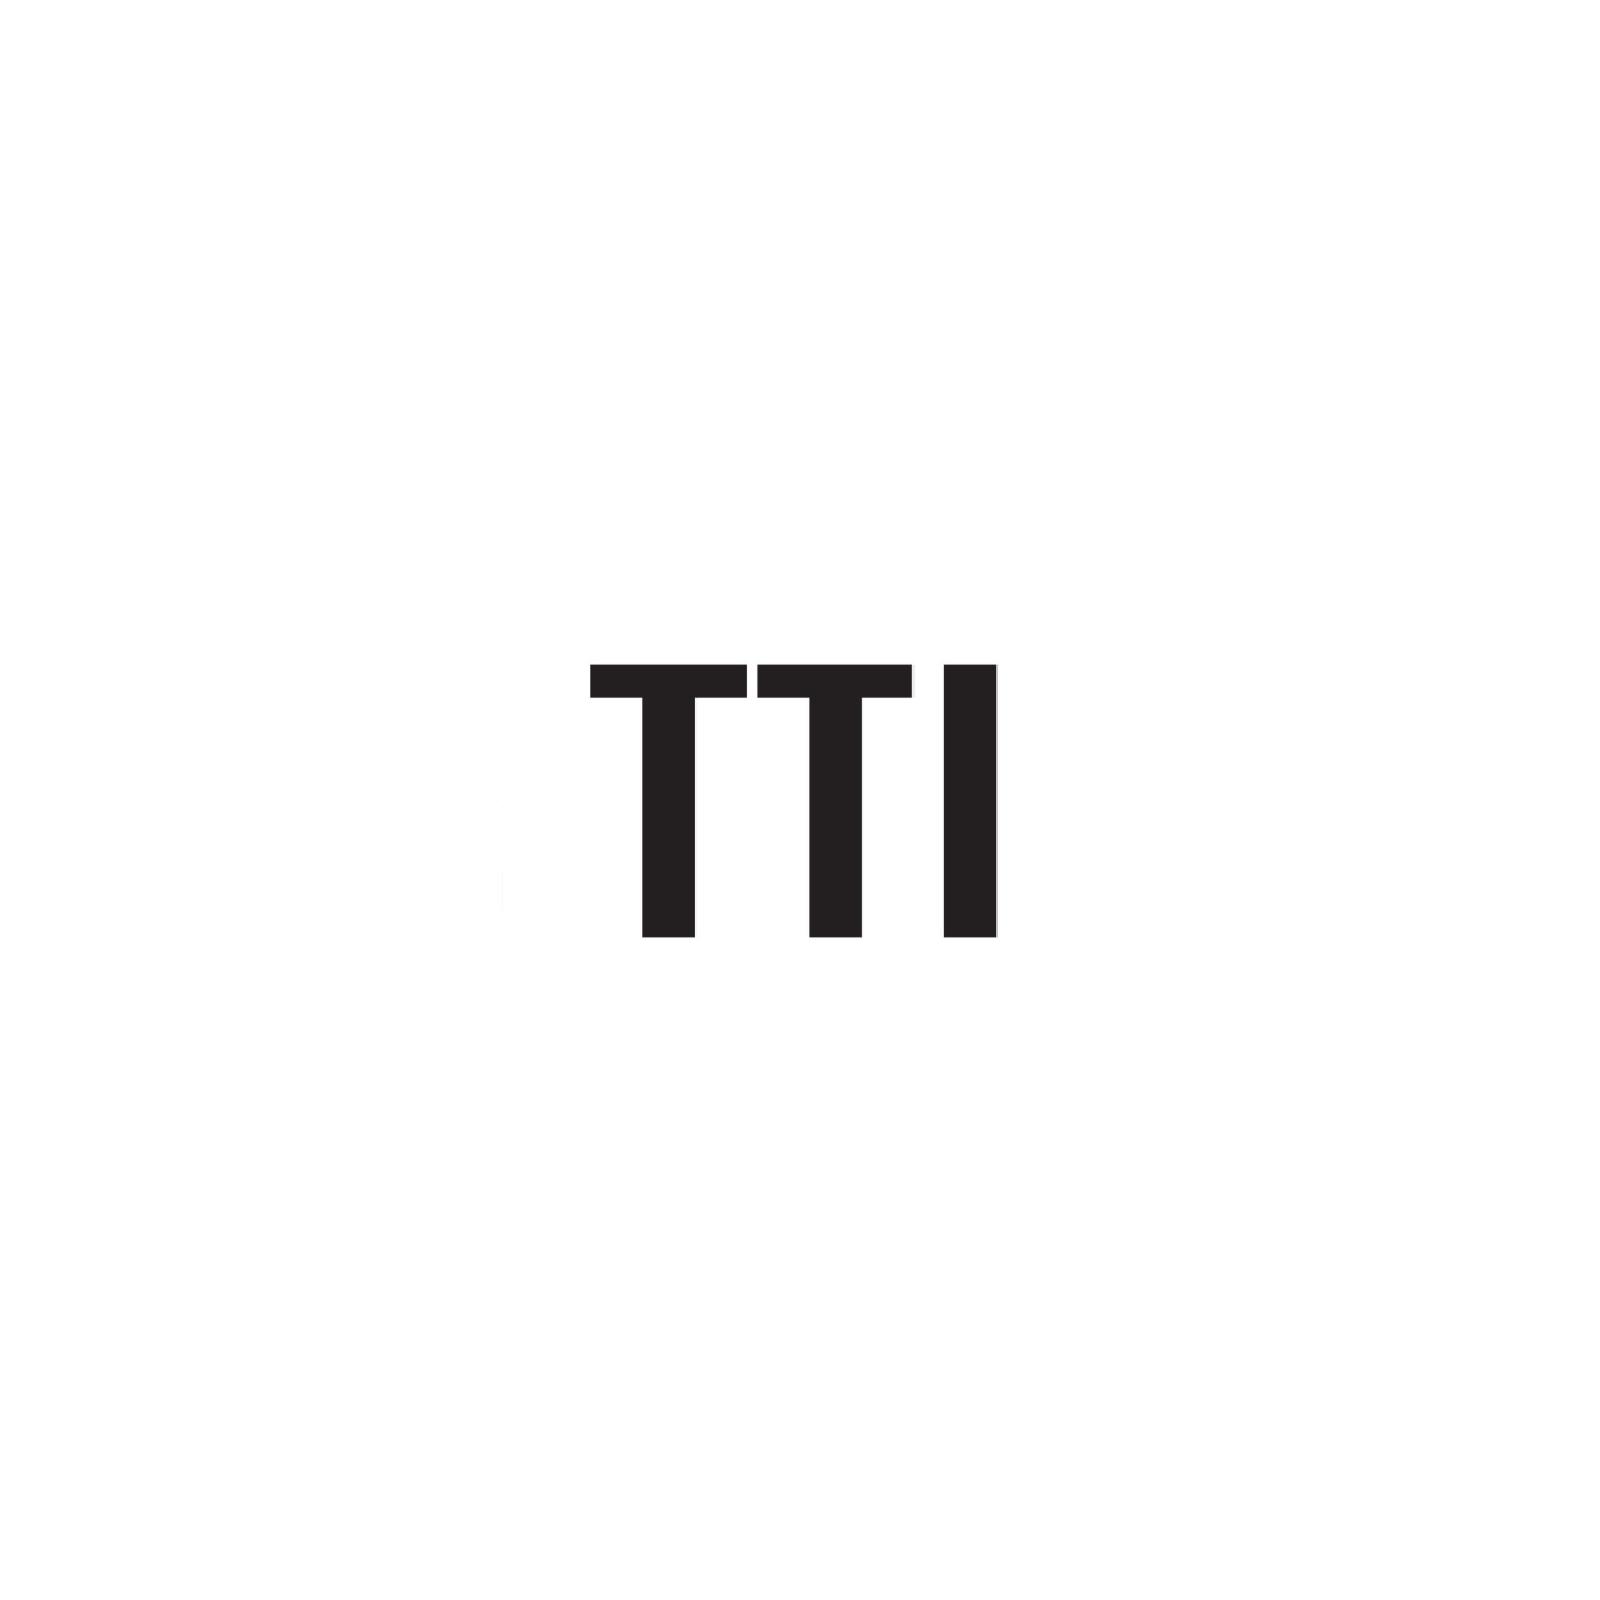 Тонер RICOH Aficio 551/700 1 кг TTI (TSM-T602-2-1)